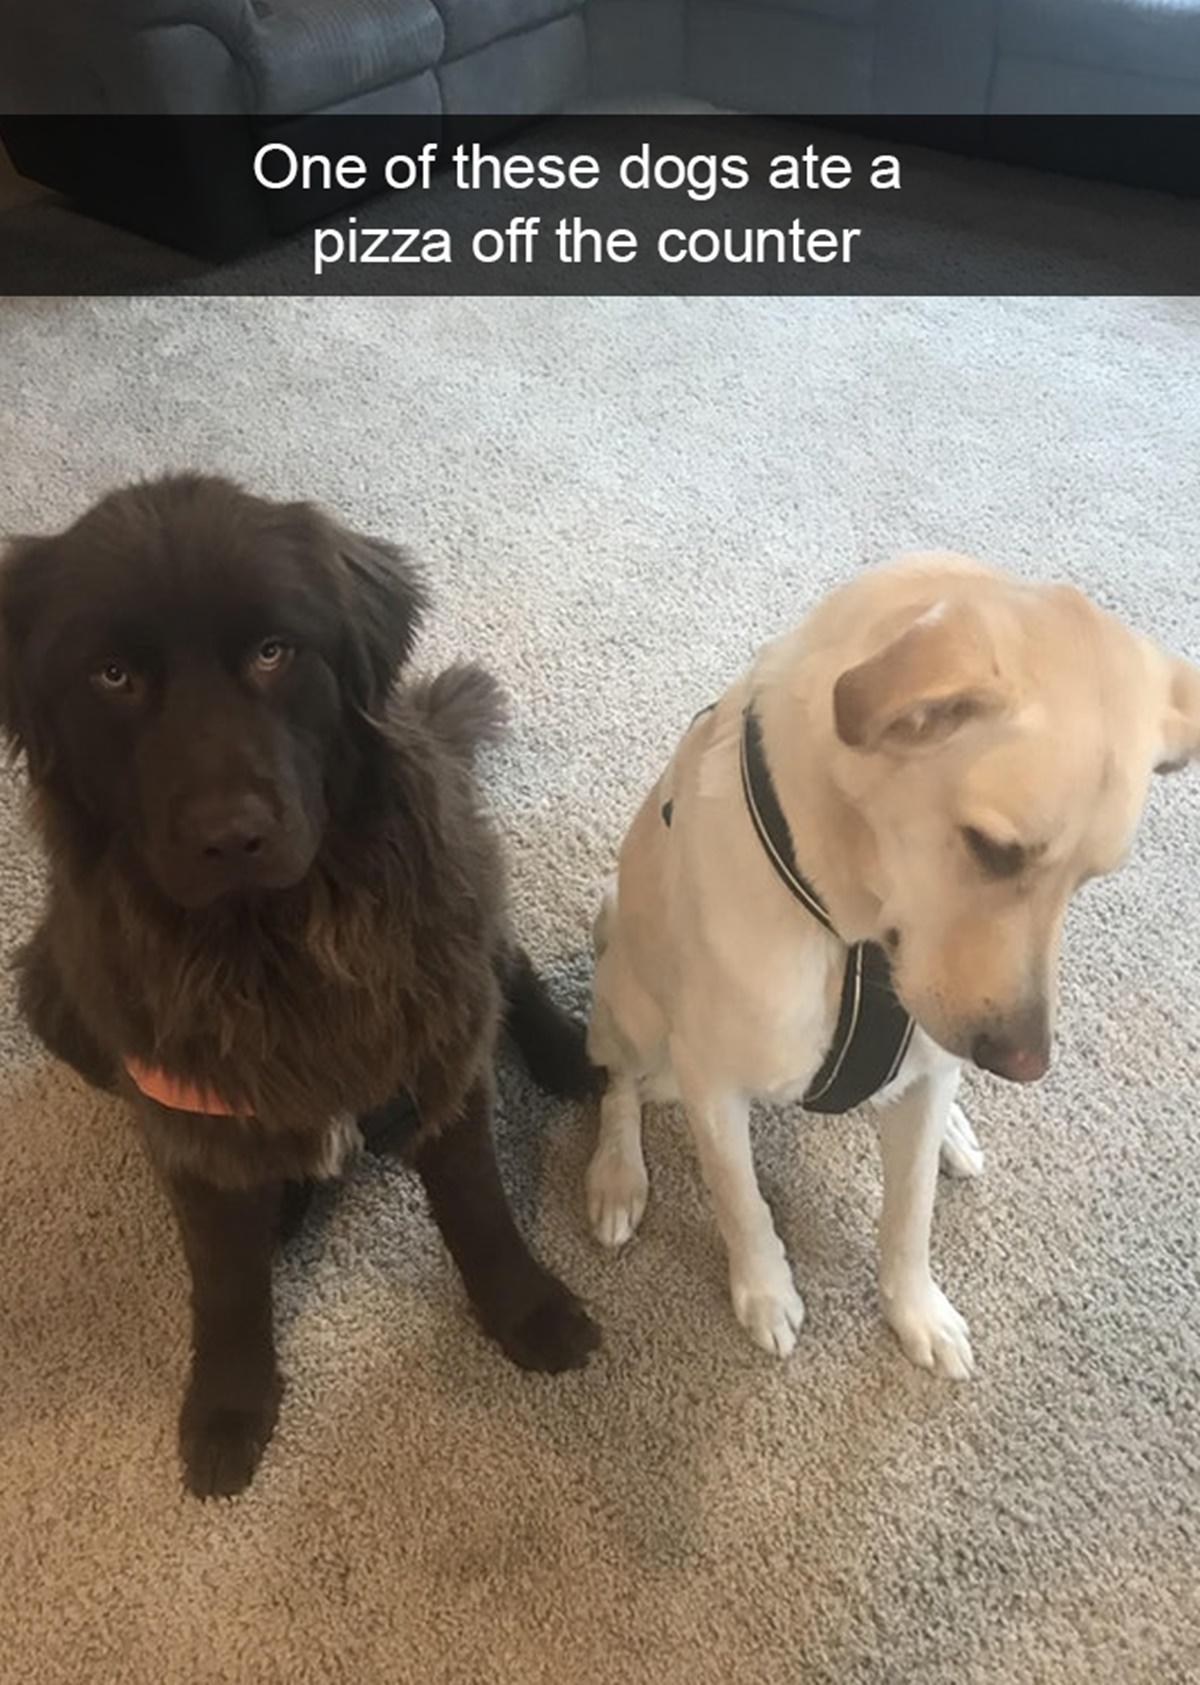 bravi ragazzi-colpevole